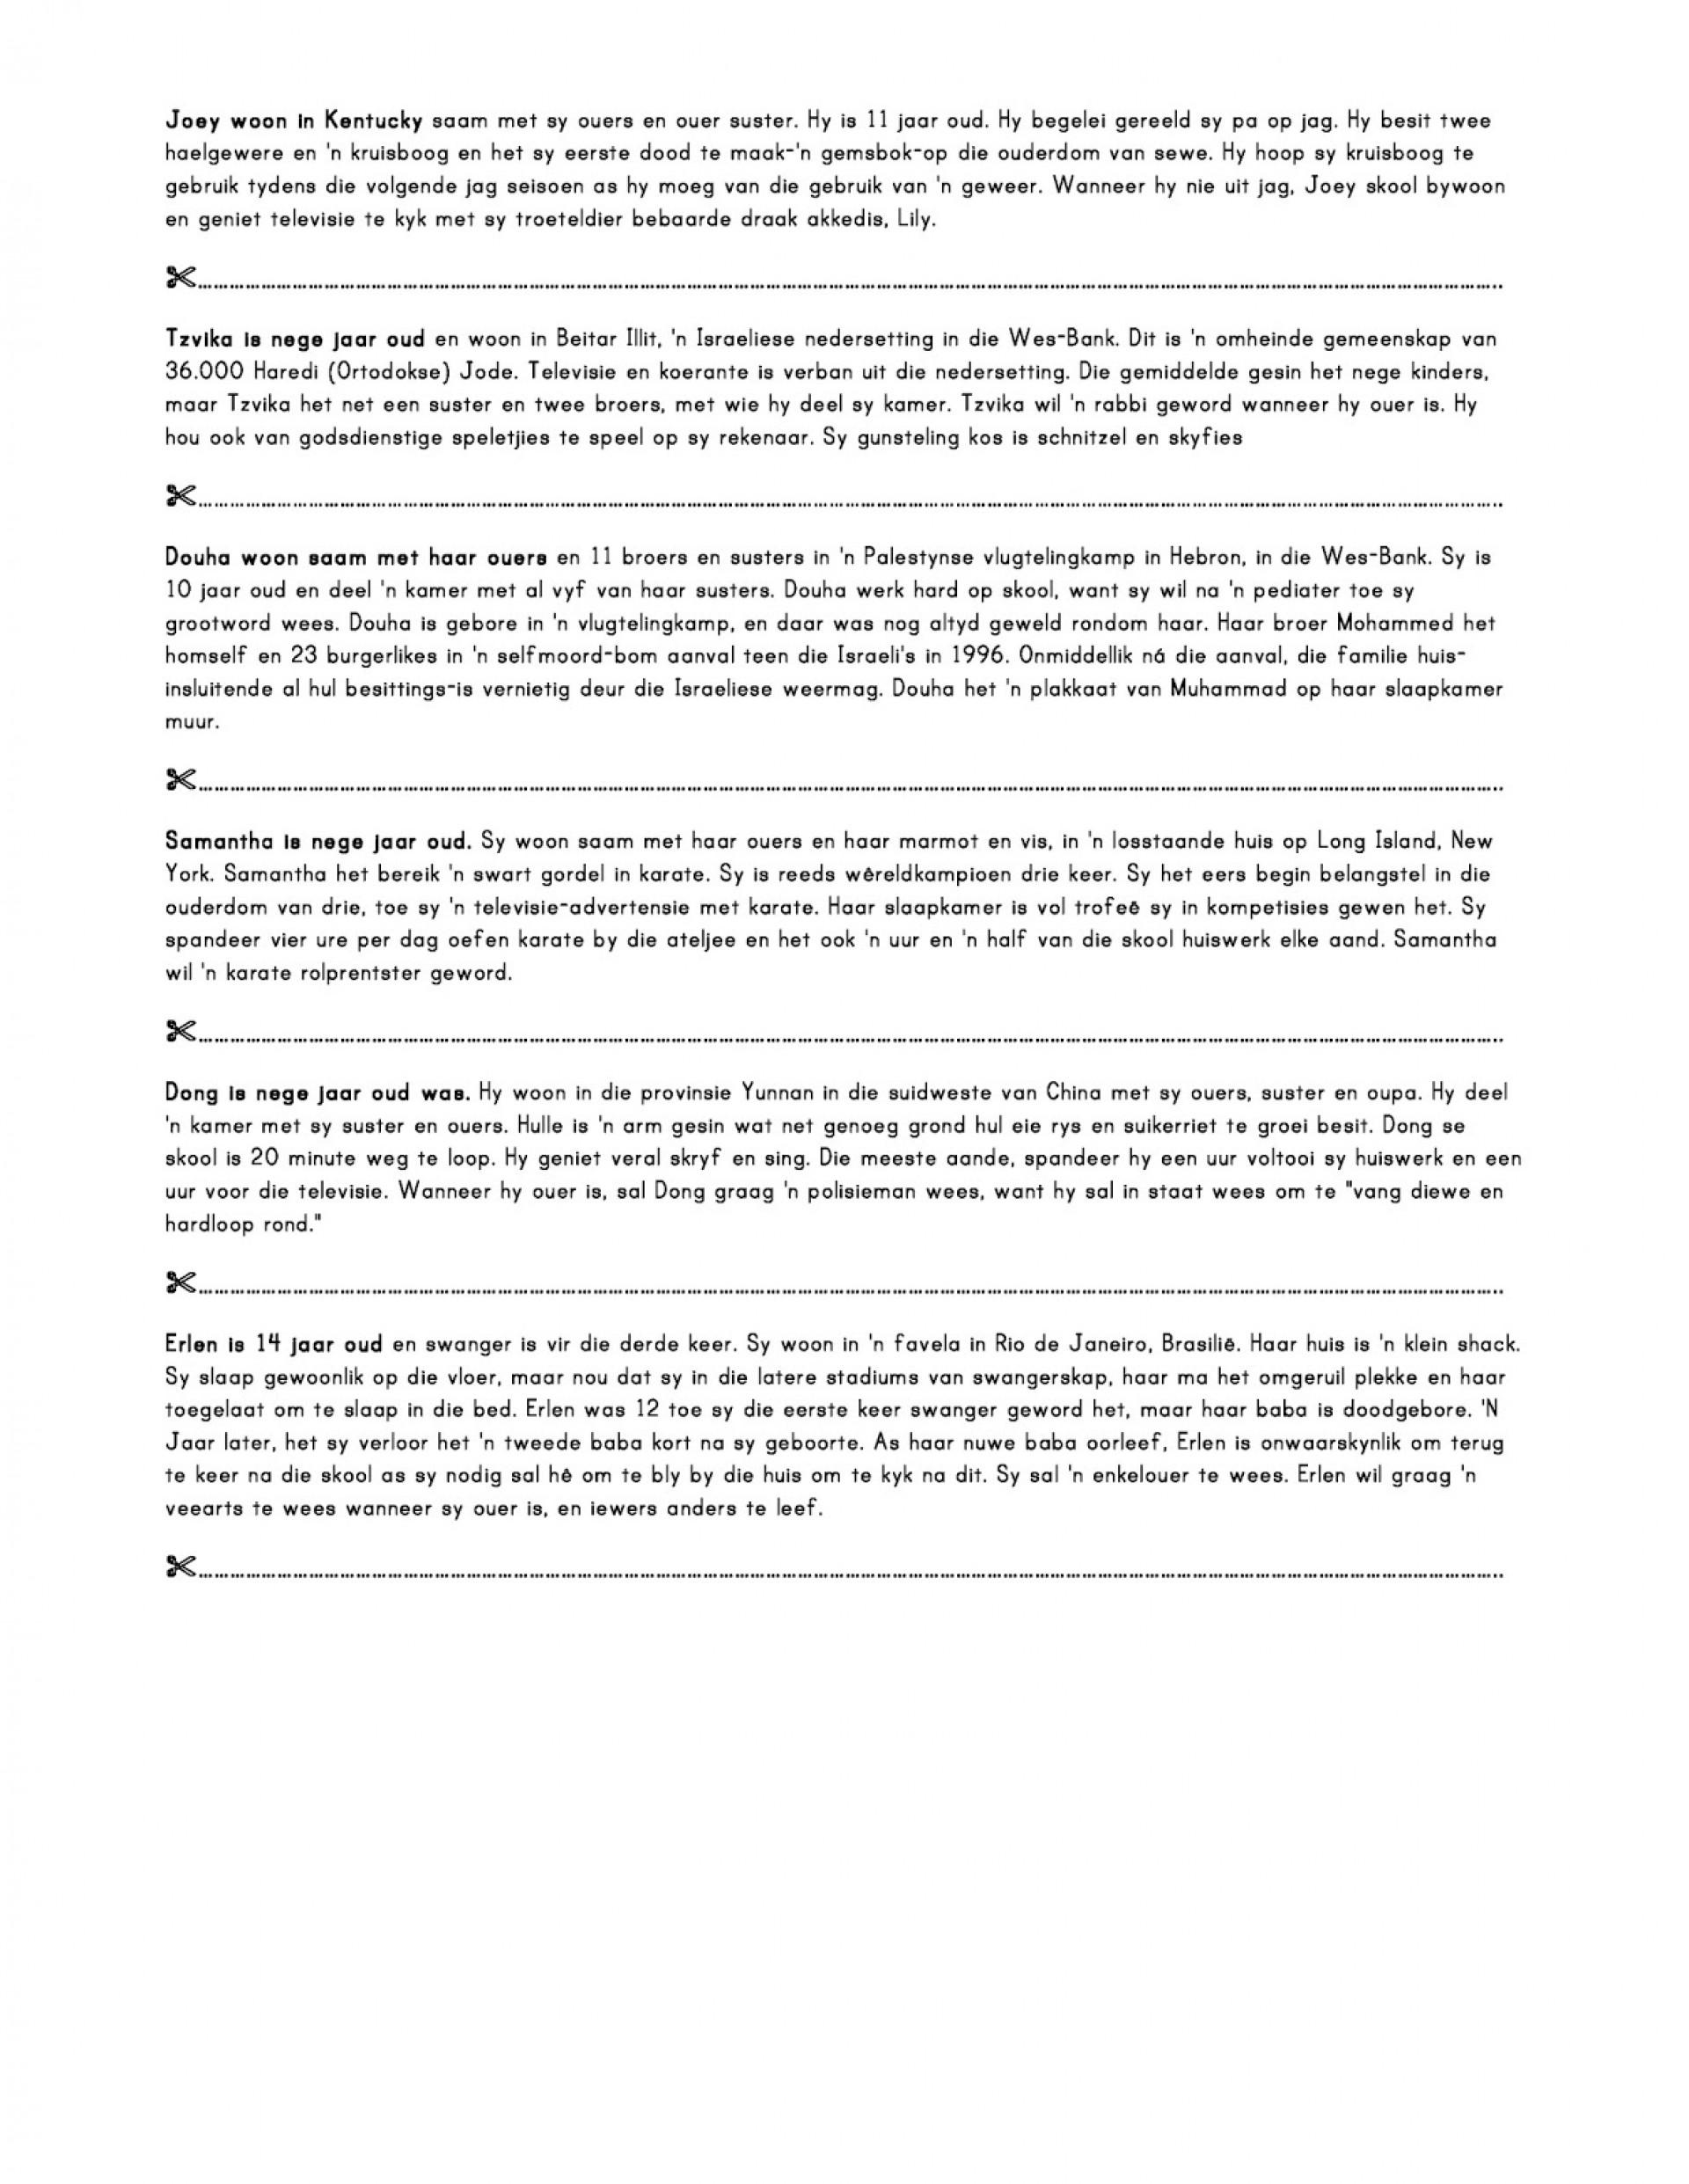 002 My Most Influential Teacher Essay Fascinating 1920